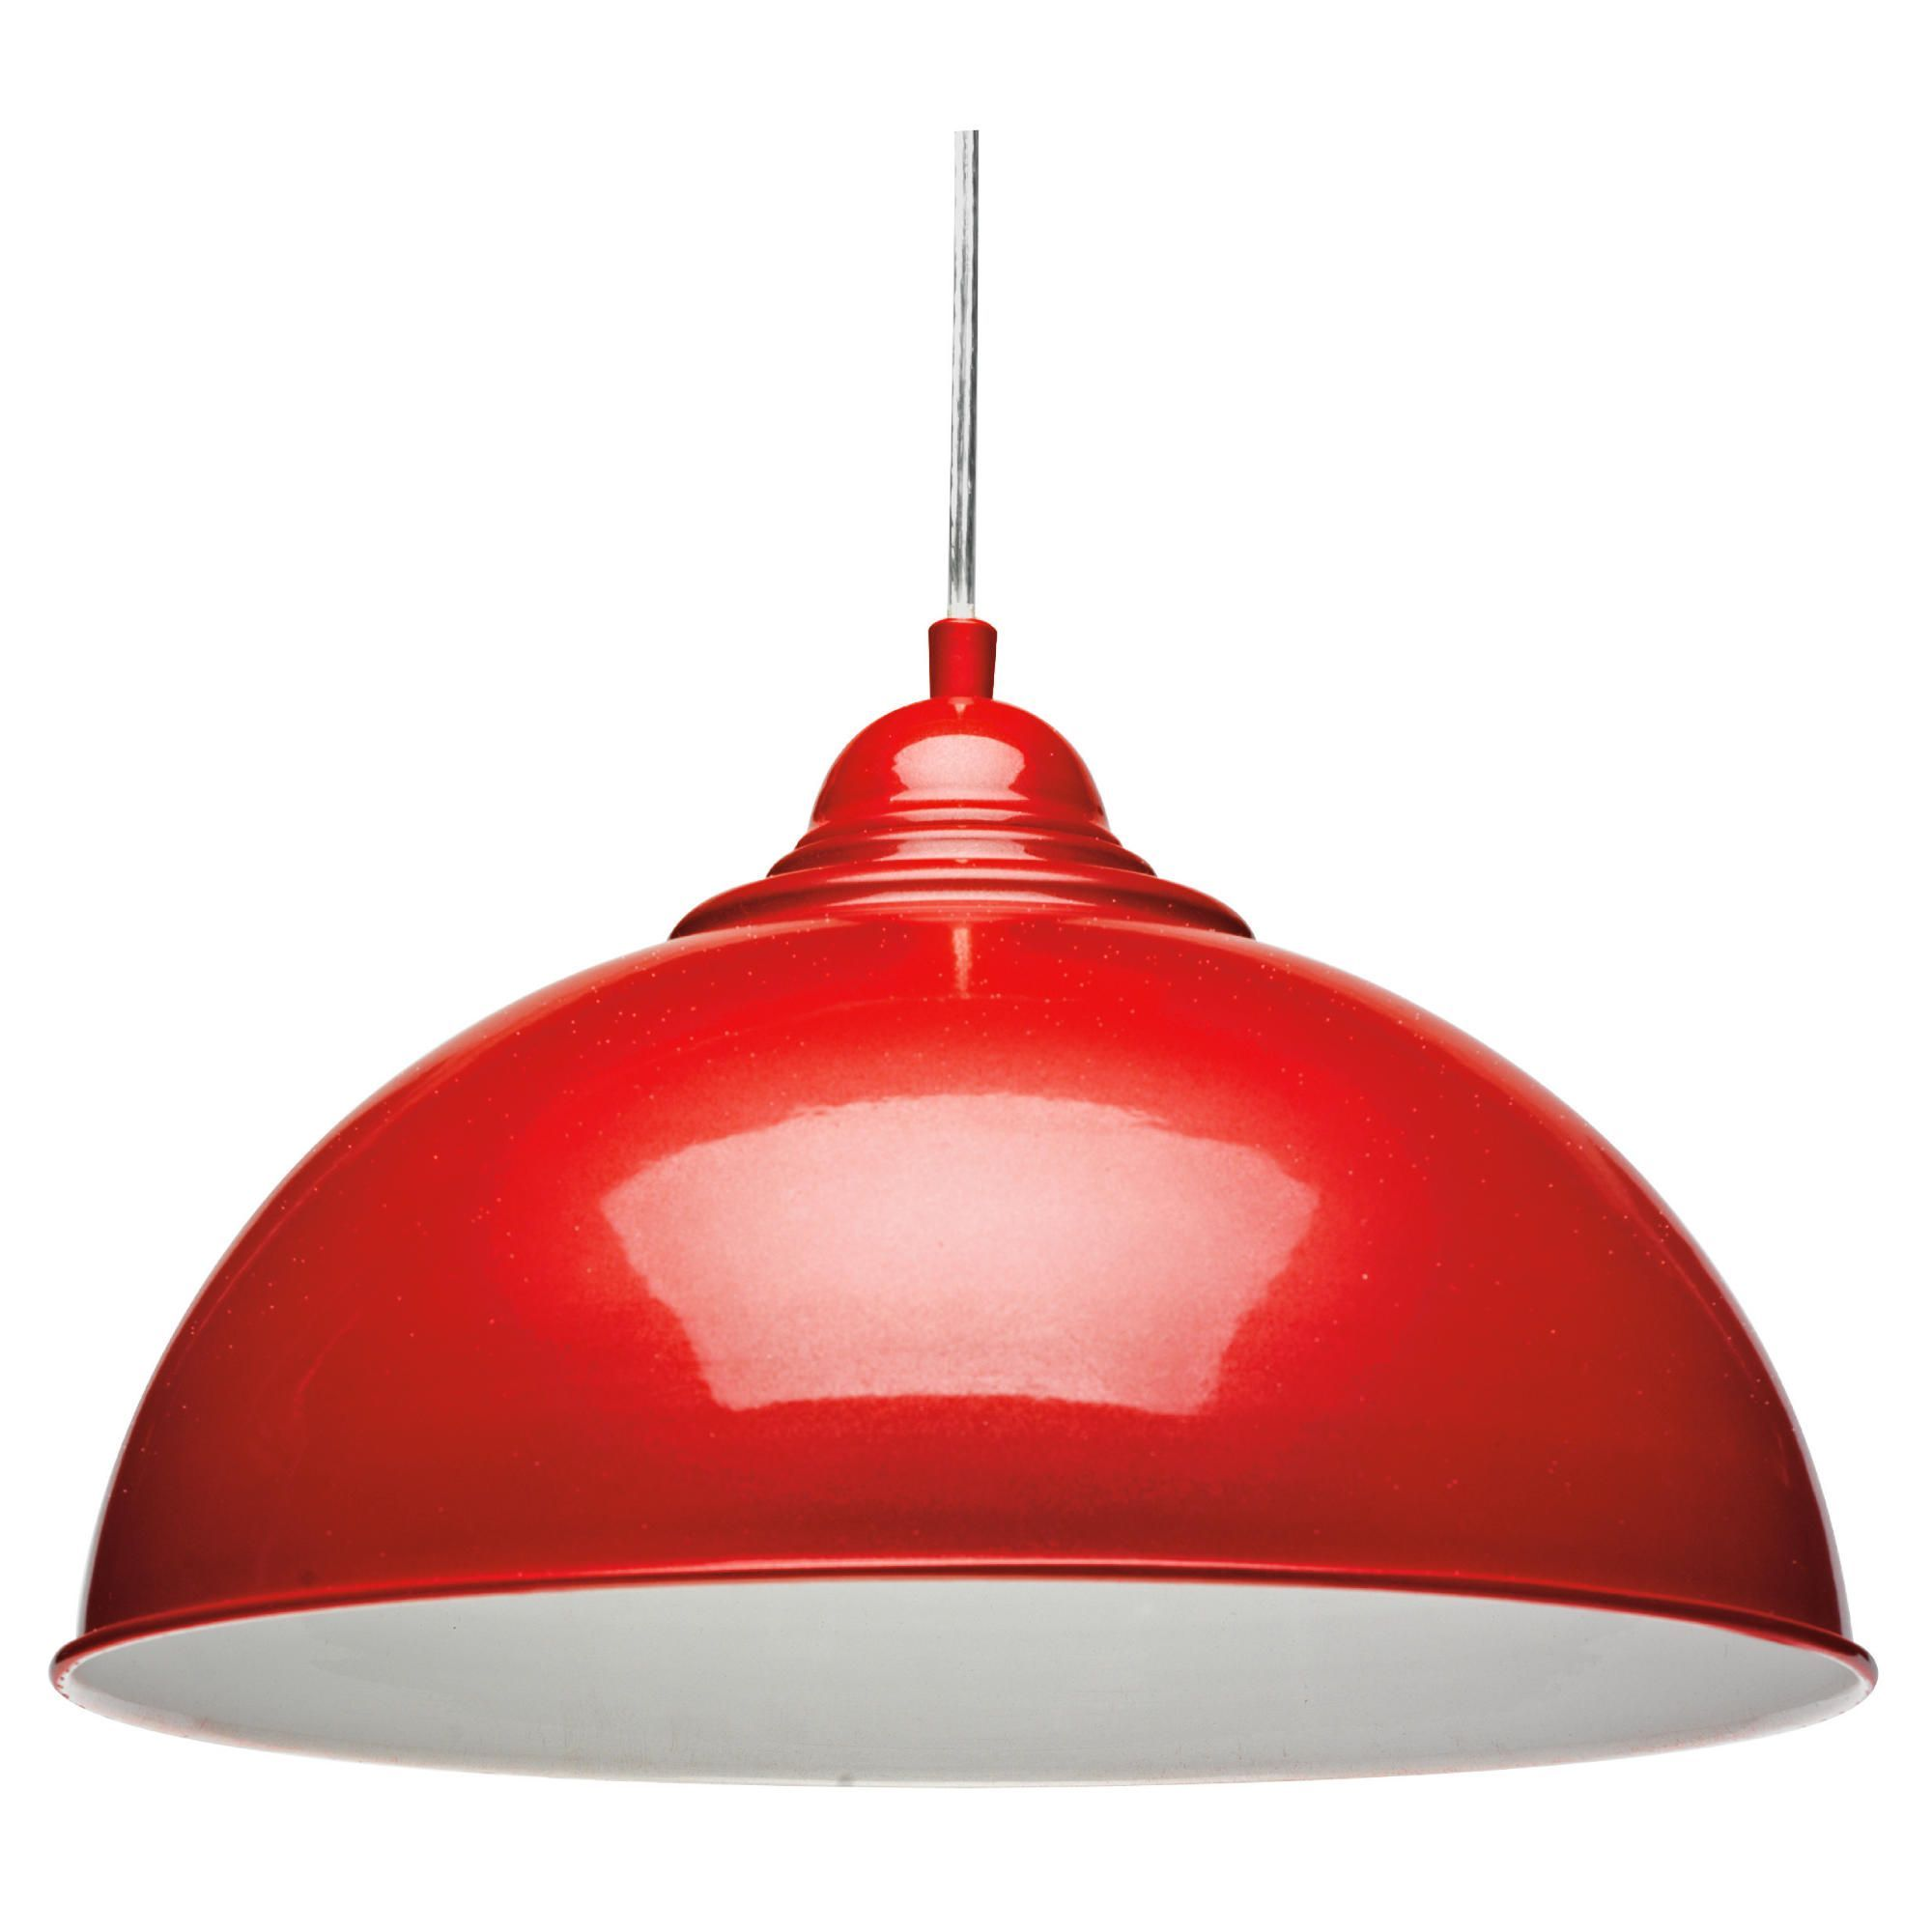 100 Pendant Lamp Cluster Modernica Blog Bocci 73 3